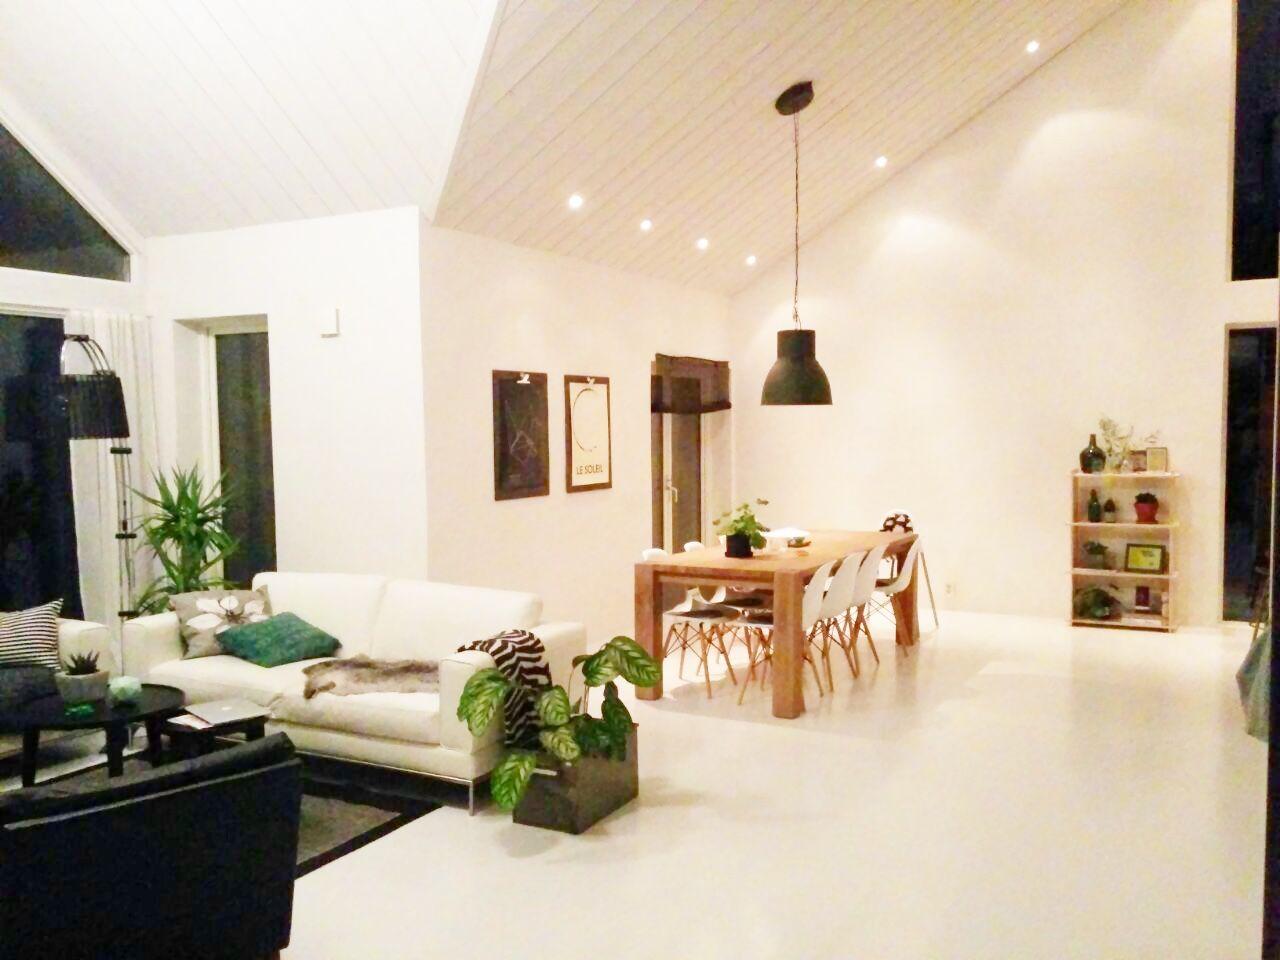 Inredning inspiration inredning sovrum : livingroom #interior #interiordesign #design #inredning #hemnet ...